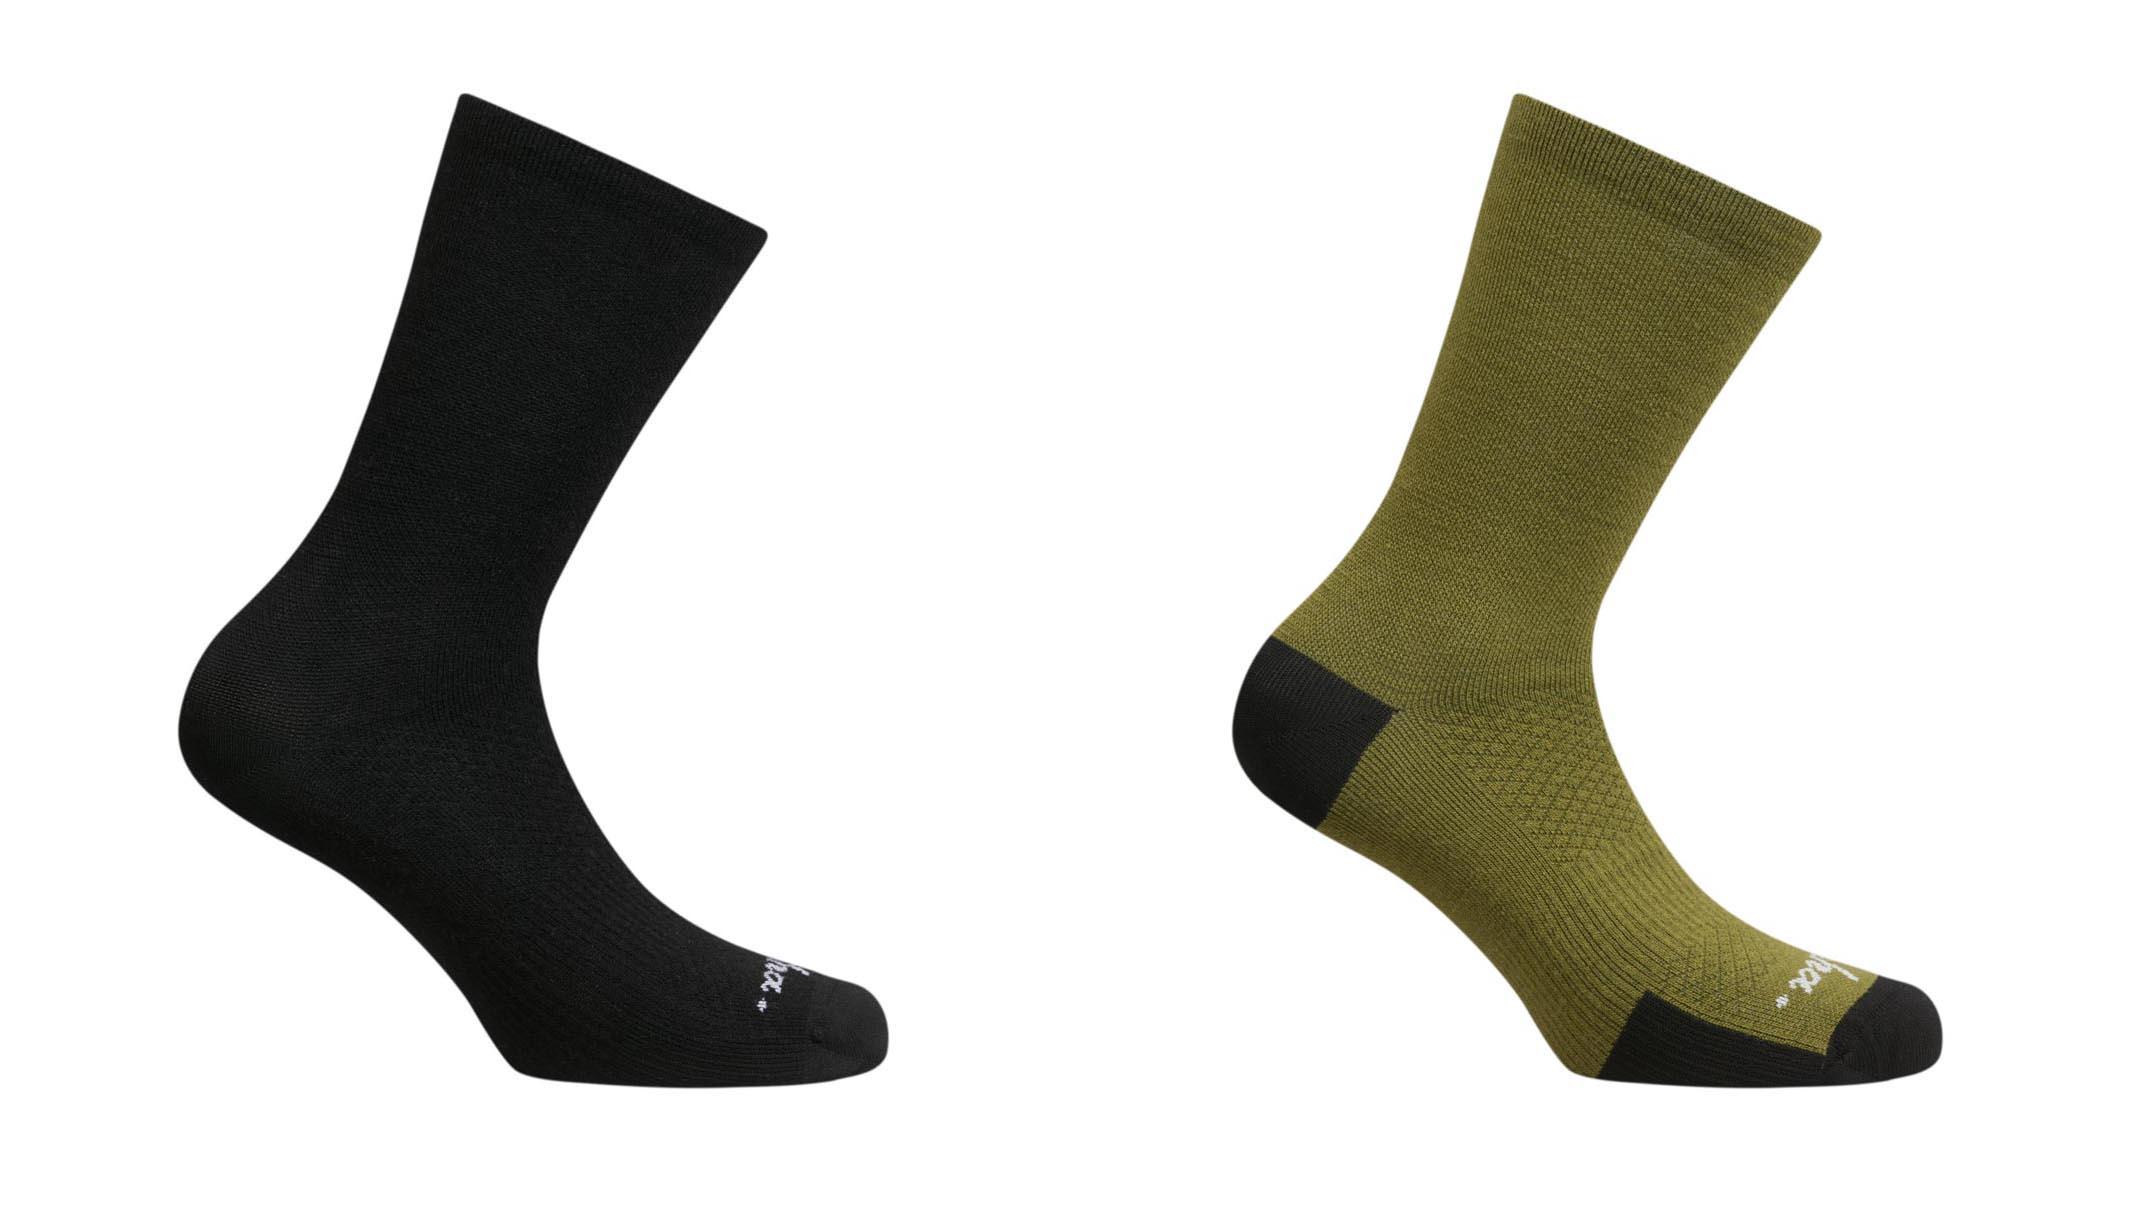 Rapha Performance Trailwear socks